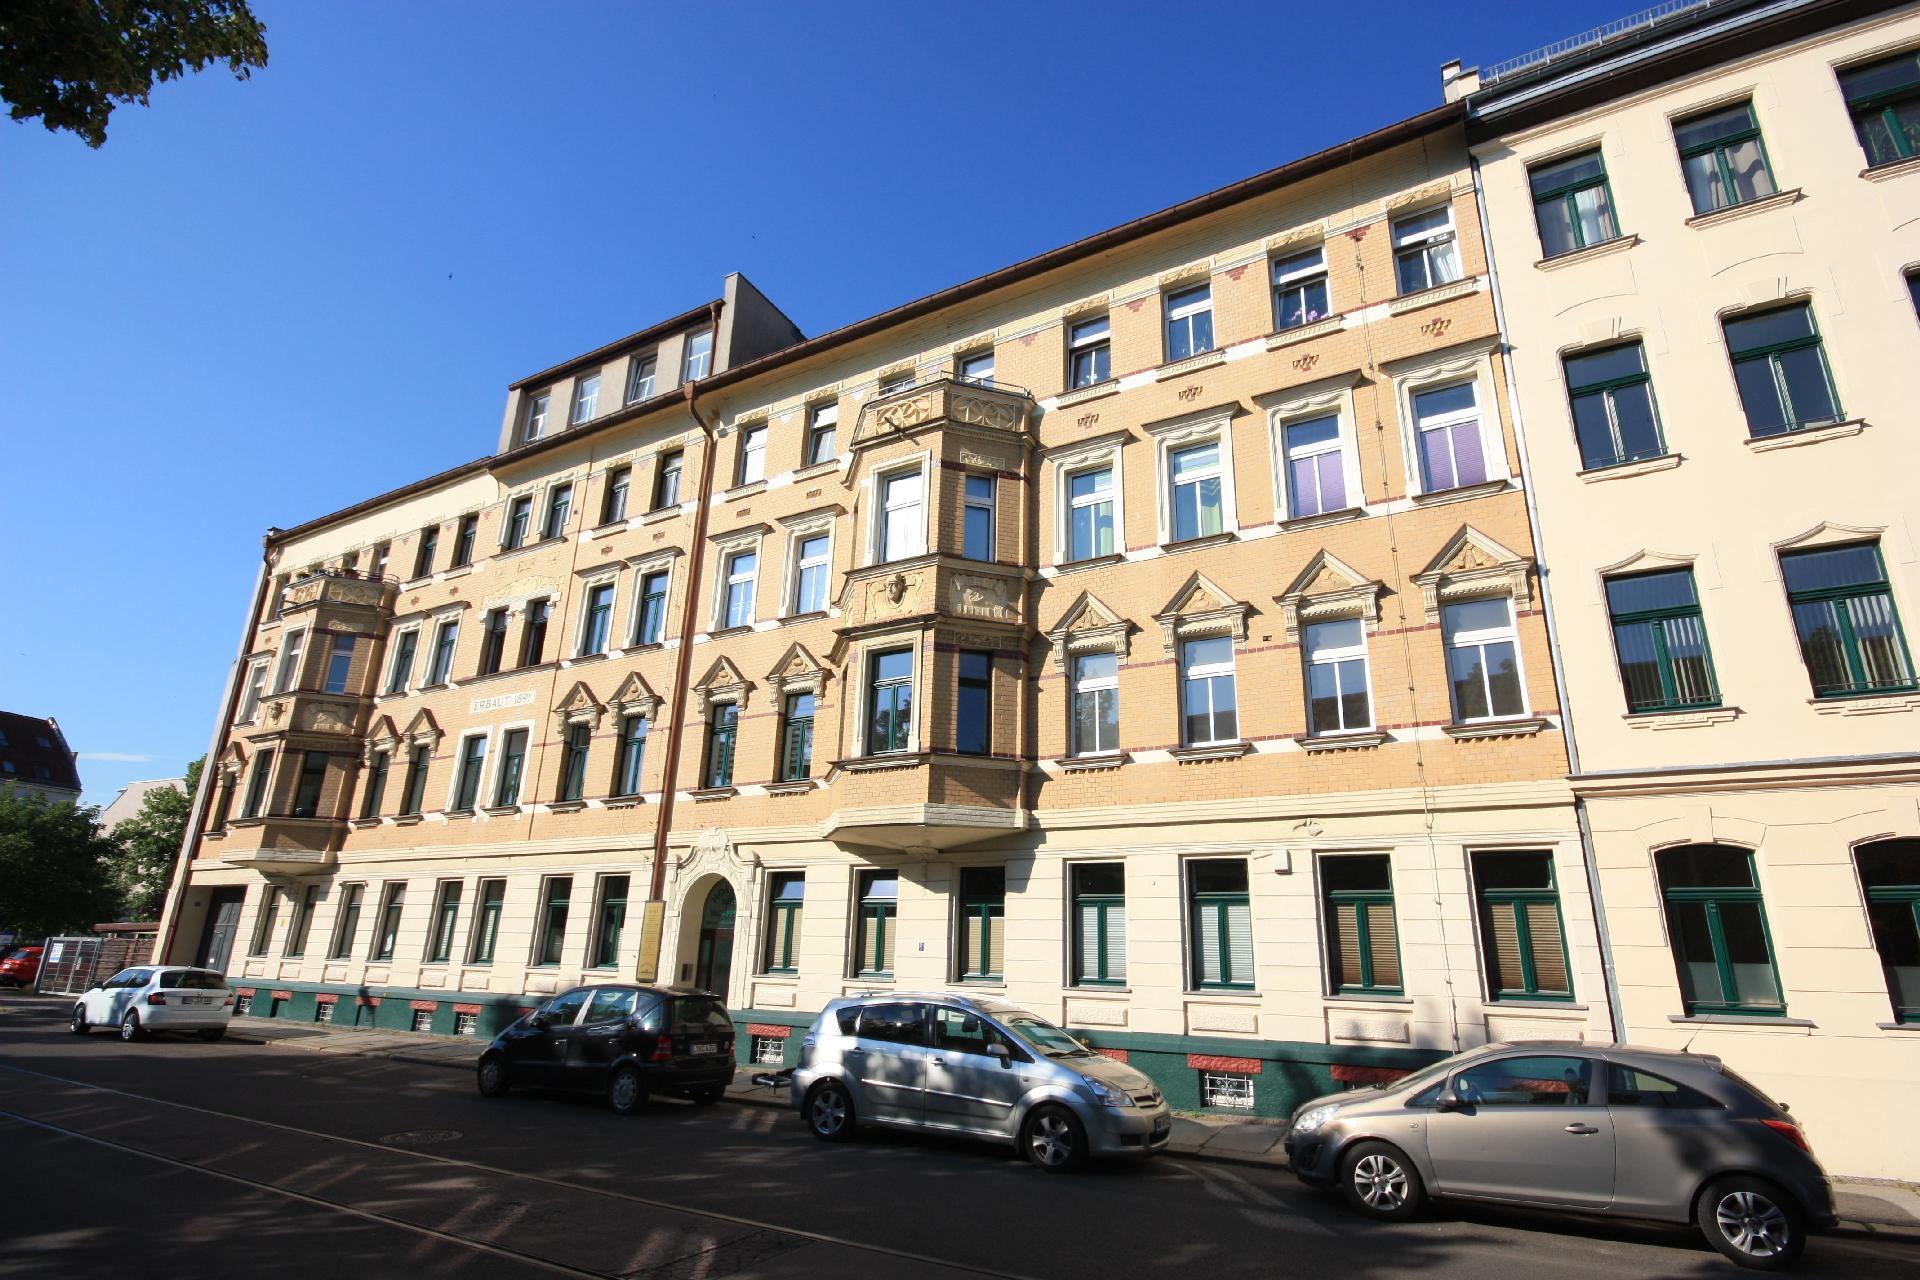 Romantik Apartments Leipzig - 2 km zum Zentrum  in Leipzig